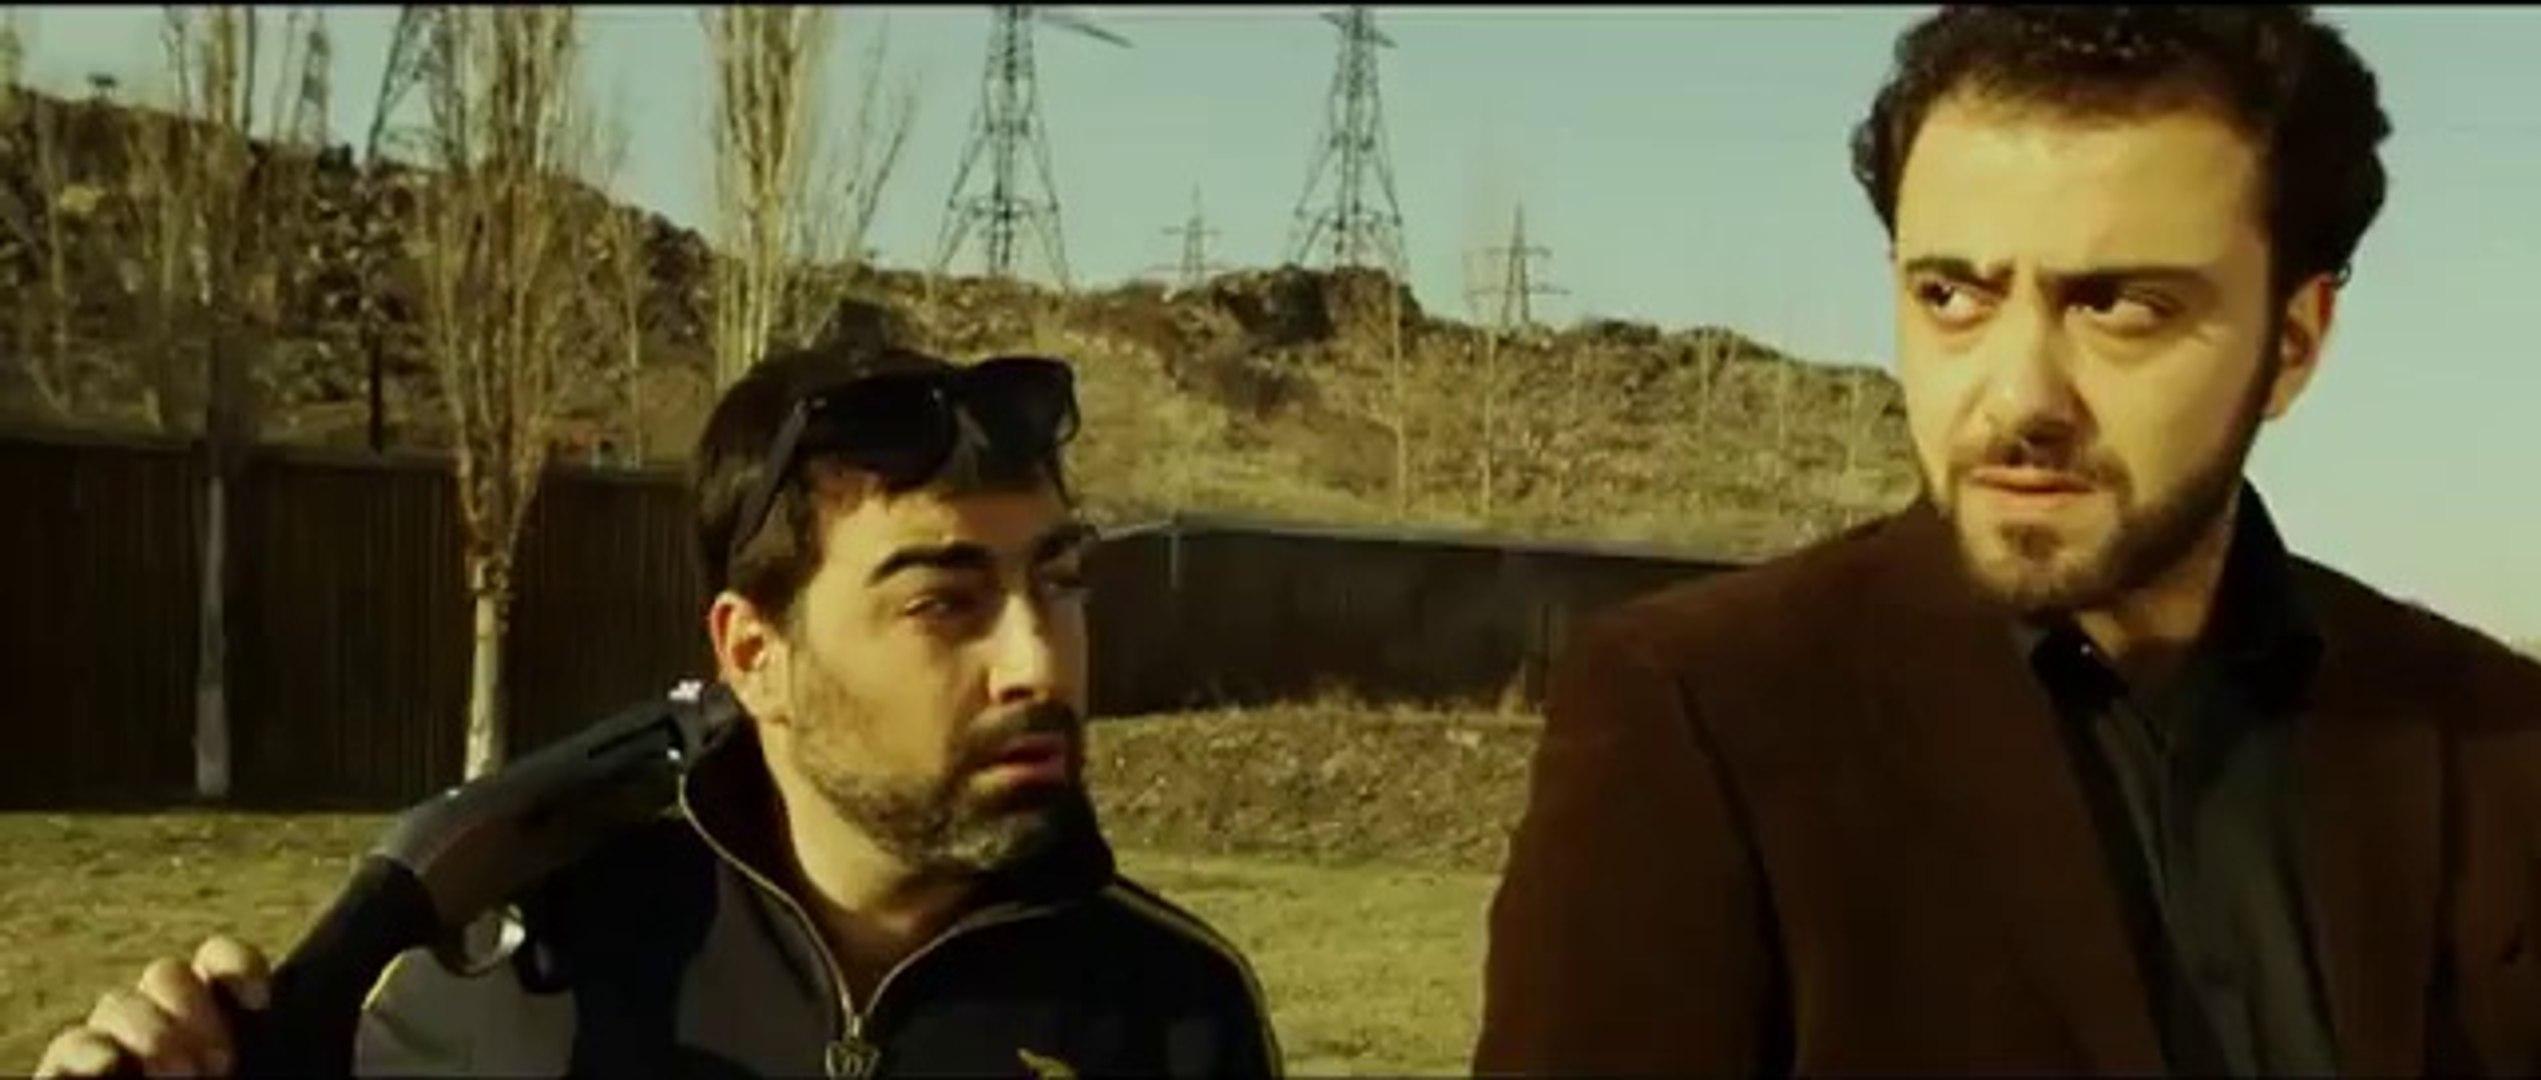 Смотреть онлайн армянский сериал Xaghic durs_16